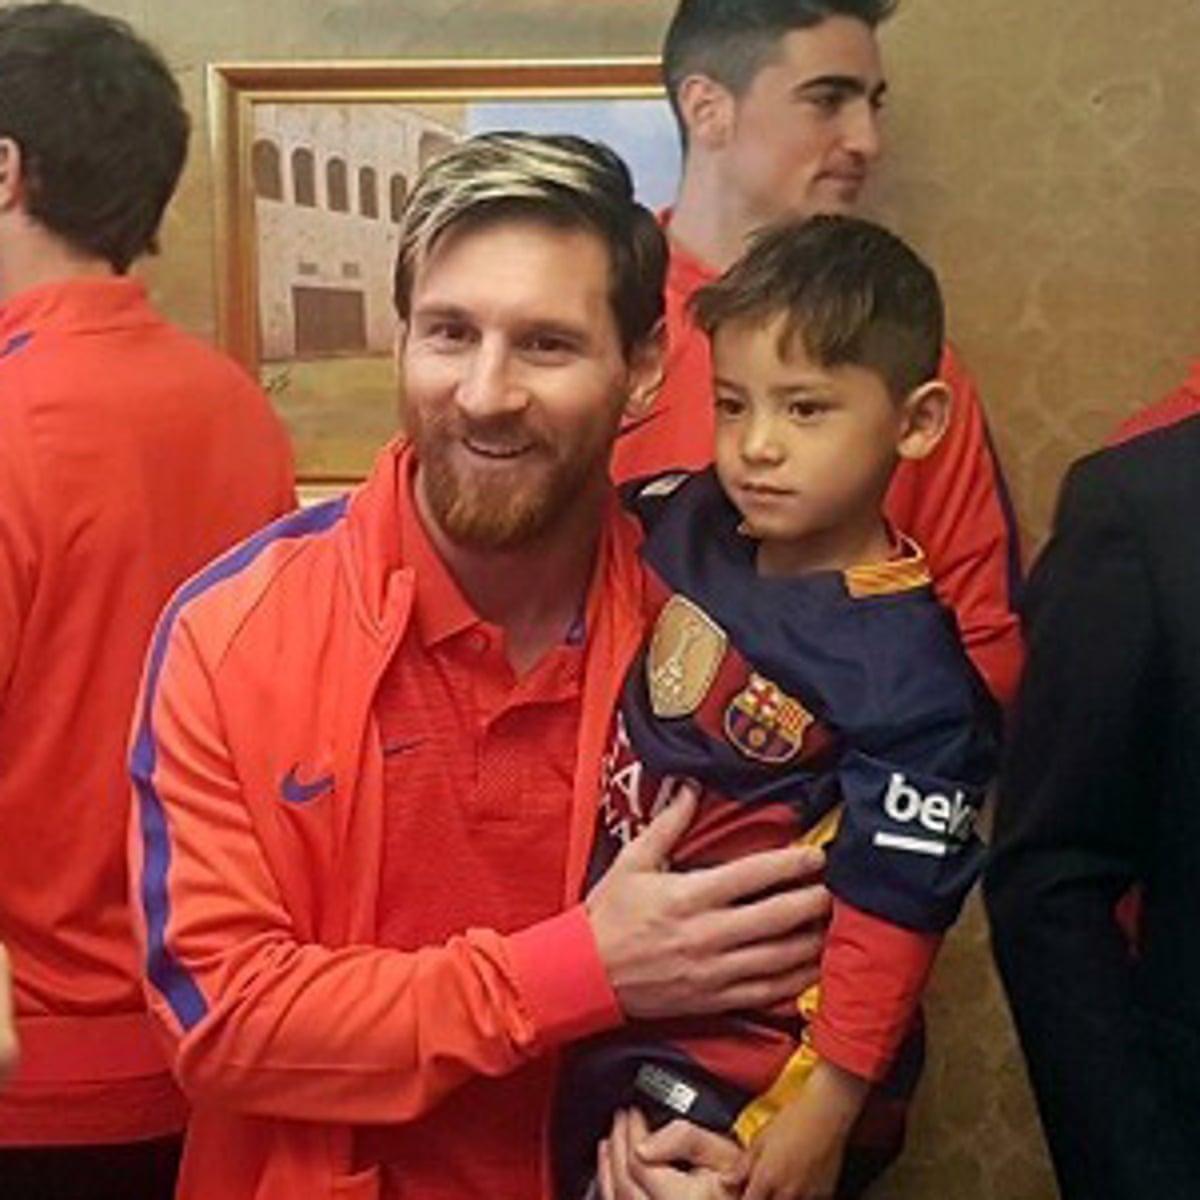 Afghan Boy Who Had Plastic Bag Messi Shirt Meets His Idol Football The Guardian